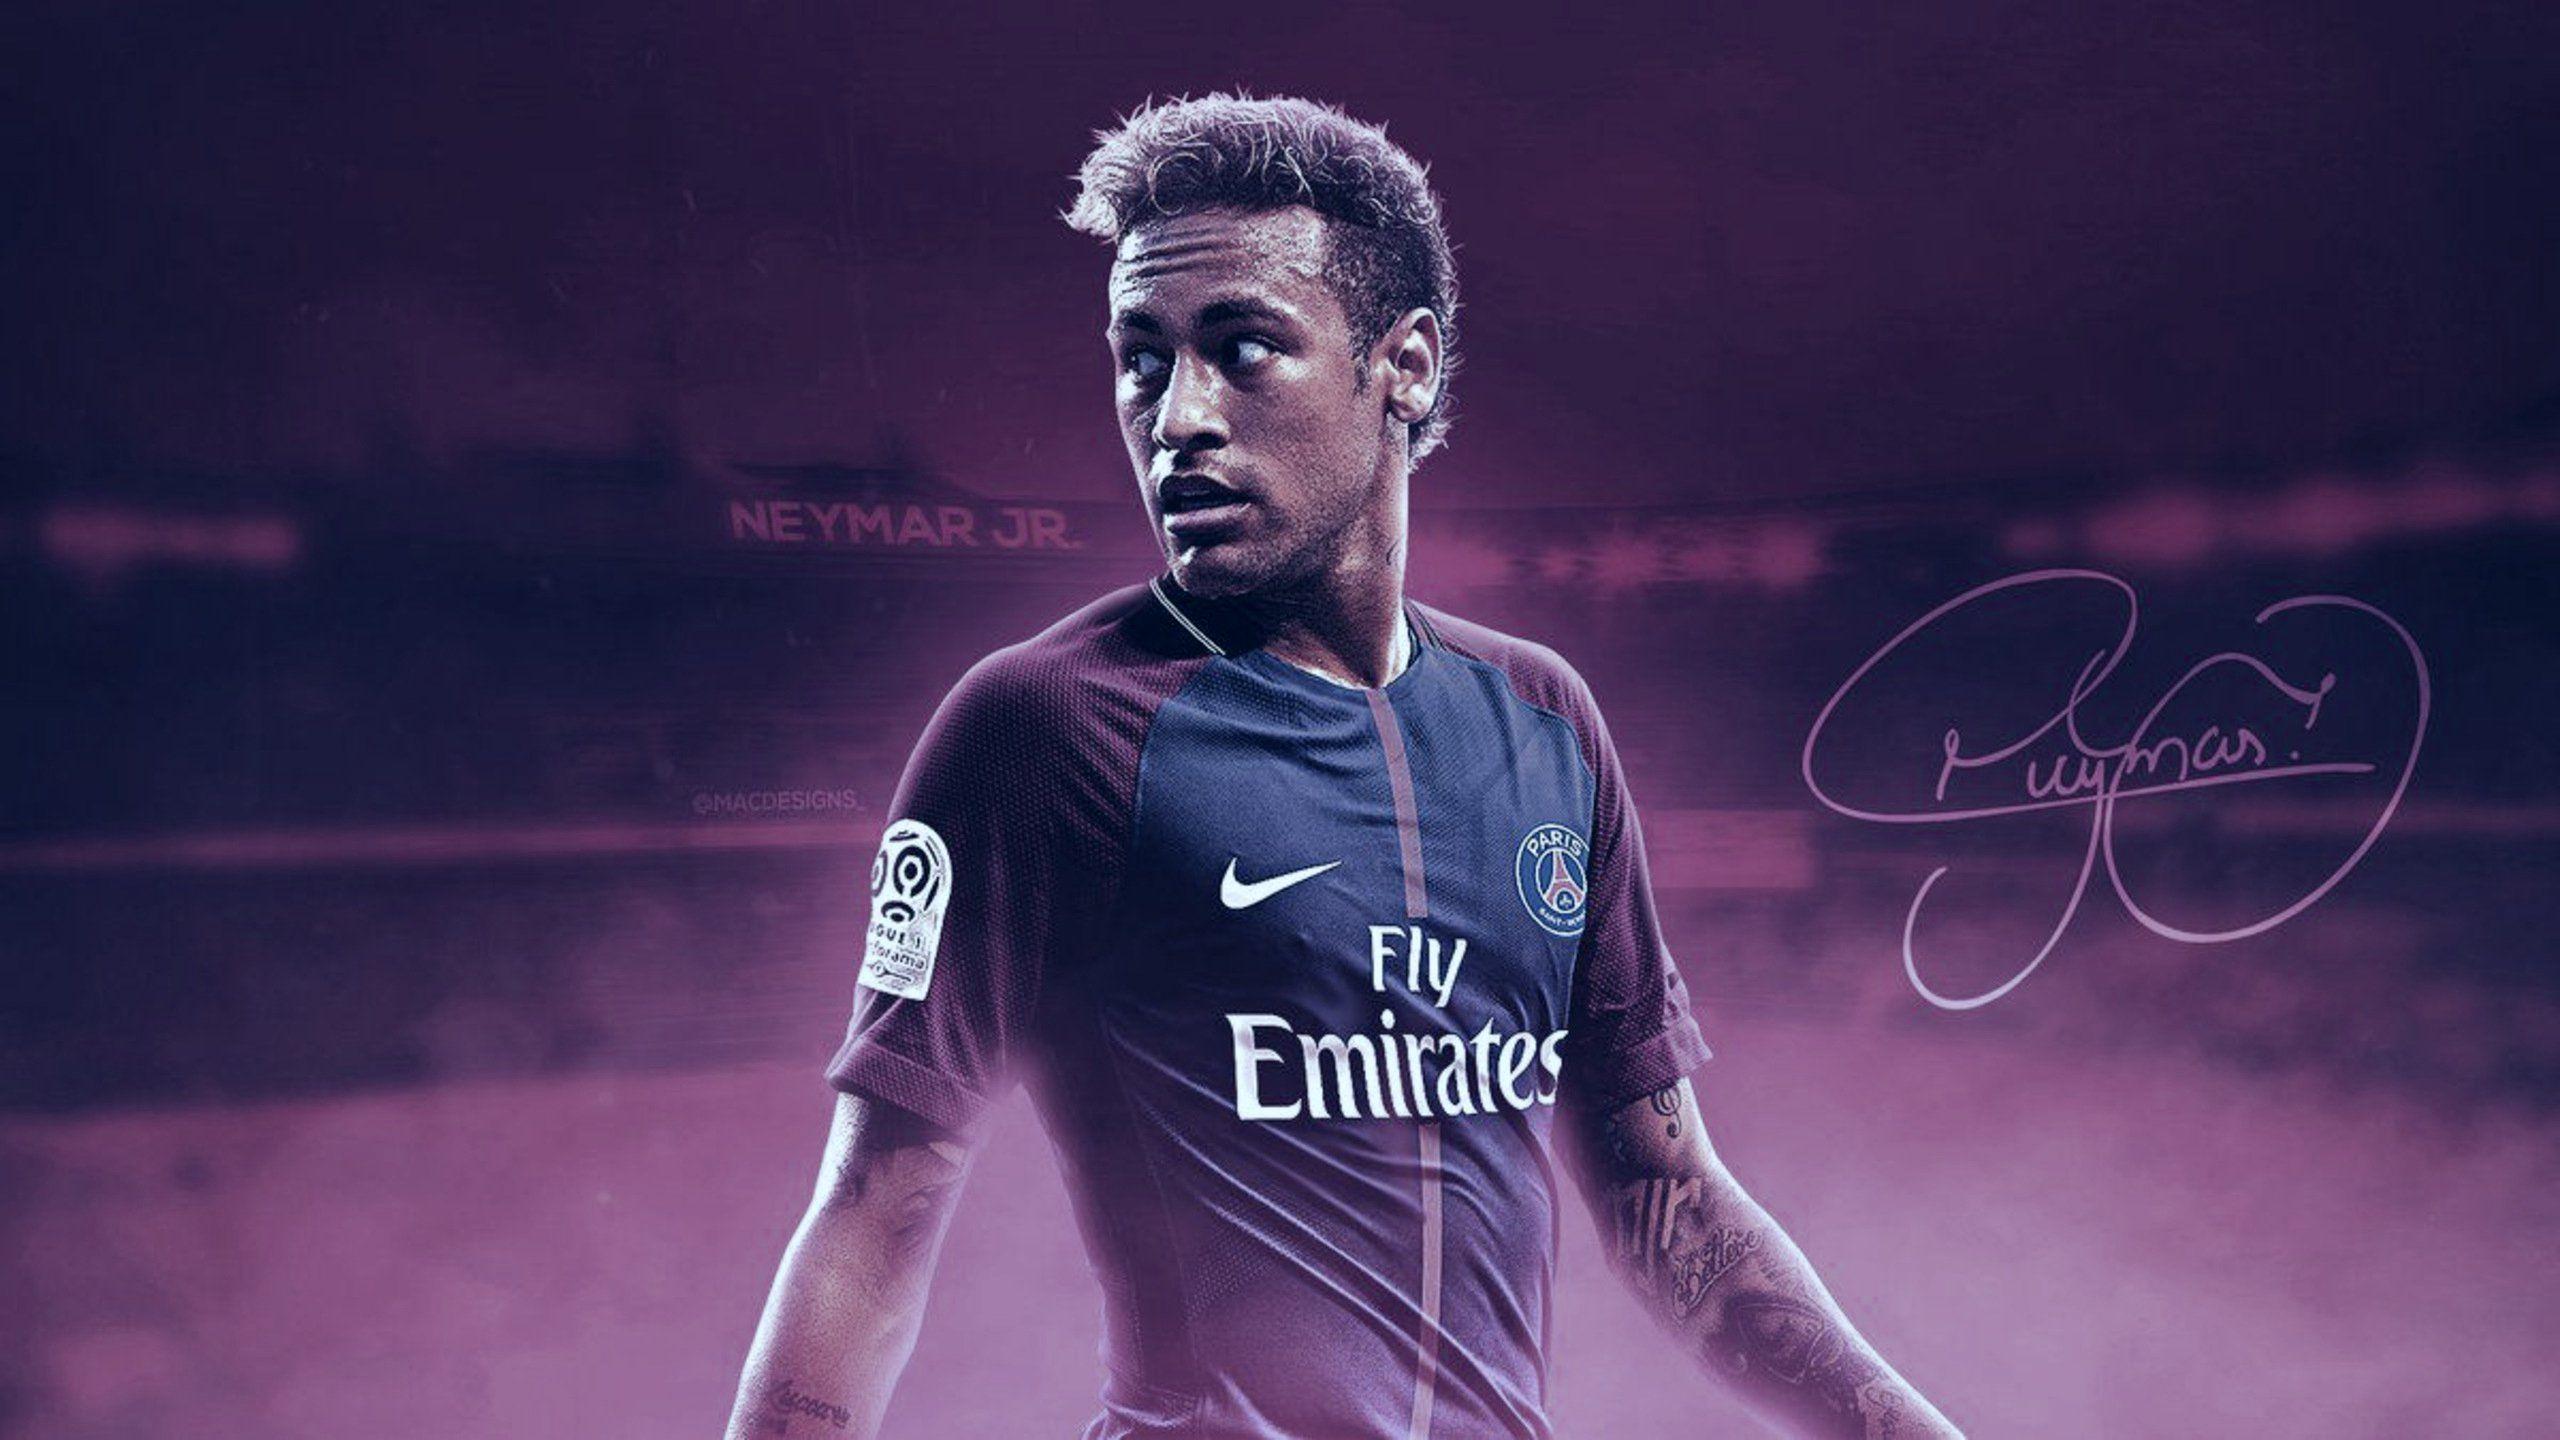 Neymar 2020 Desktop Wallpapers Top Free Neymar 2020 Desktop Backgrounds Wallpaperaccess